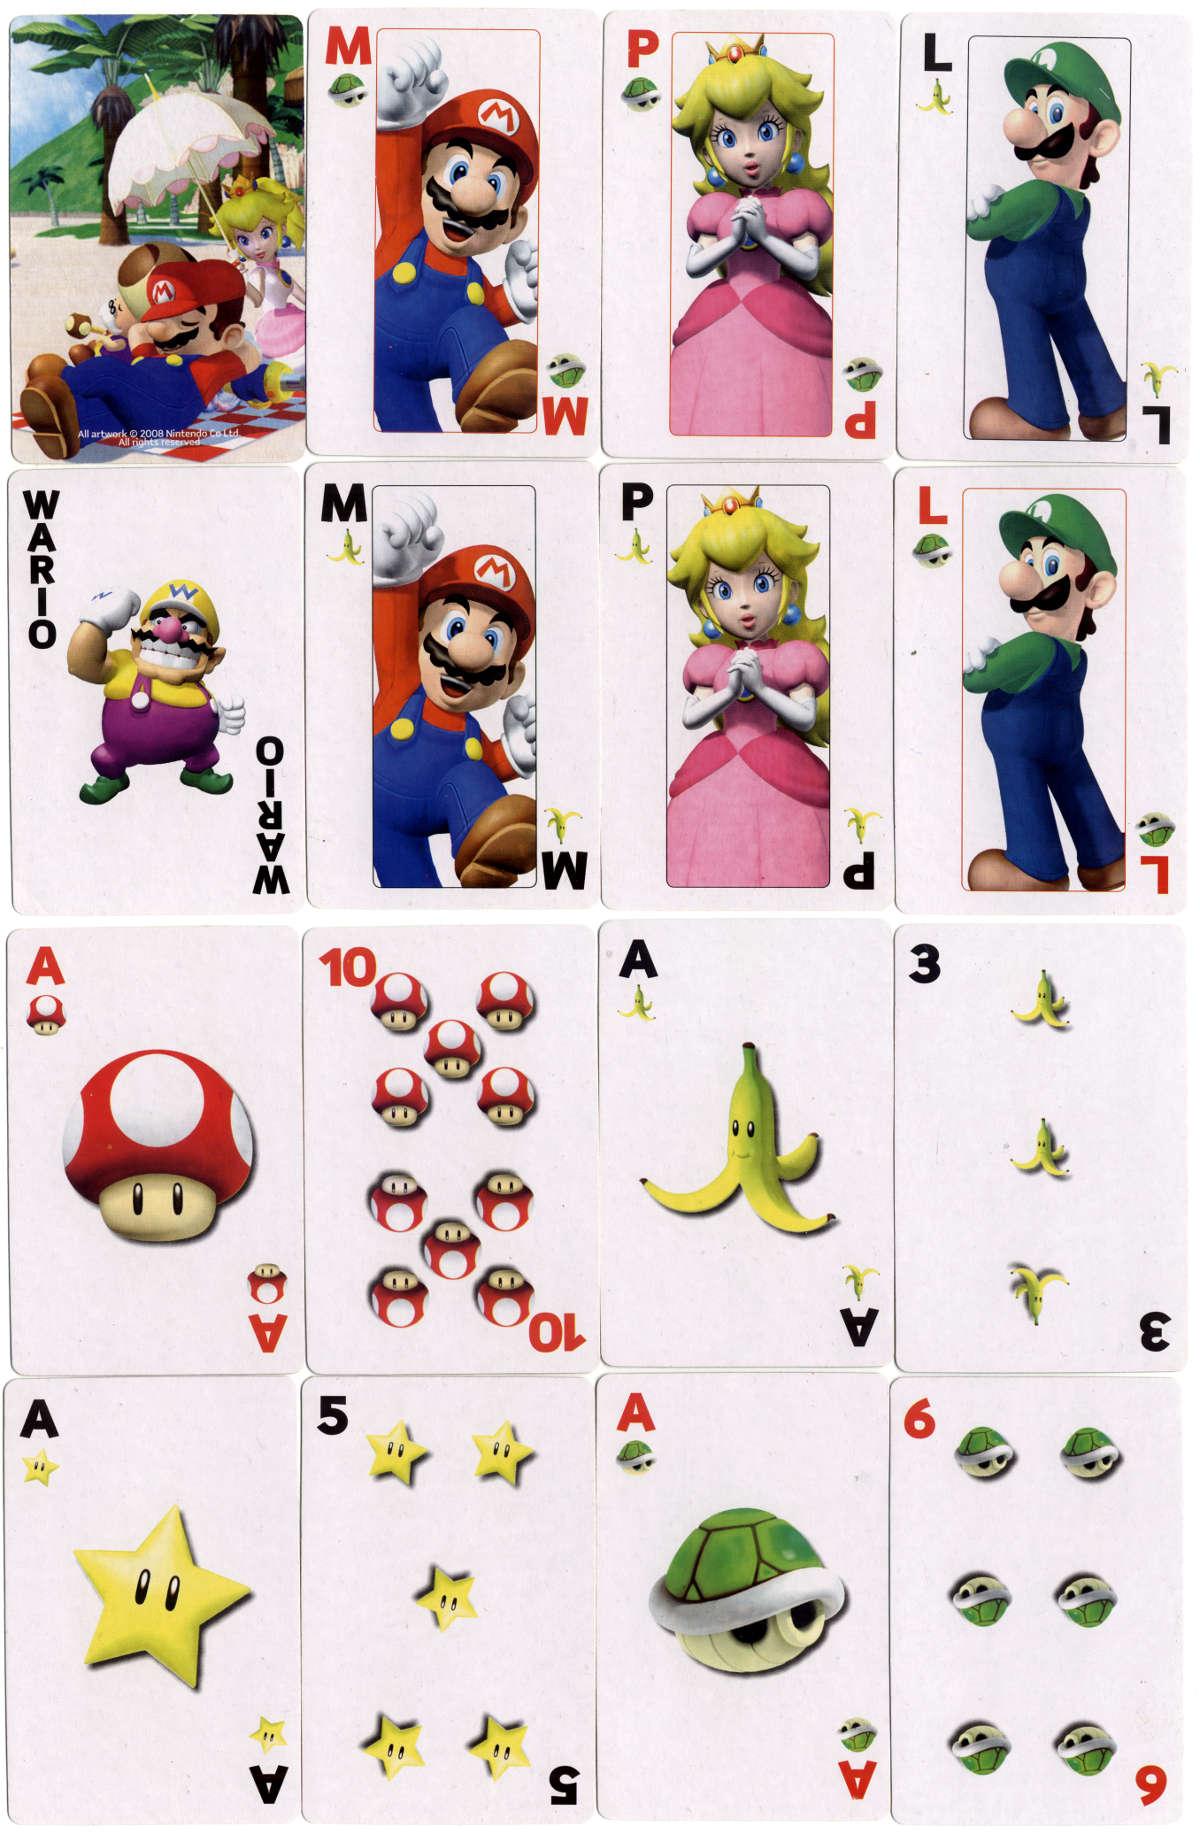 Nintendo's Mario-Wario Playing Cards. All artwork ©2008 Nintendo Co., Ltd